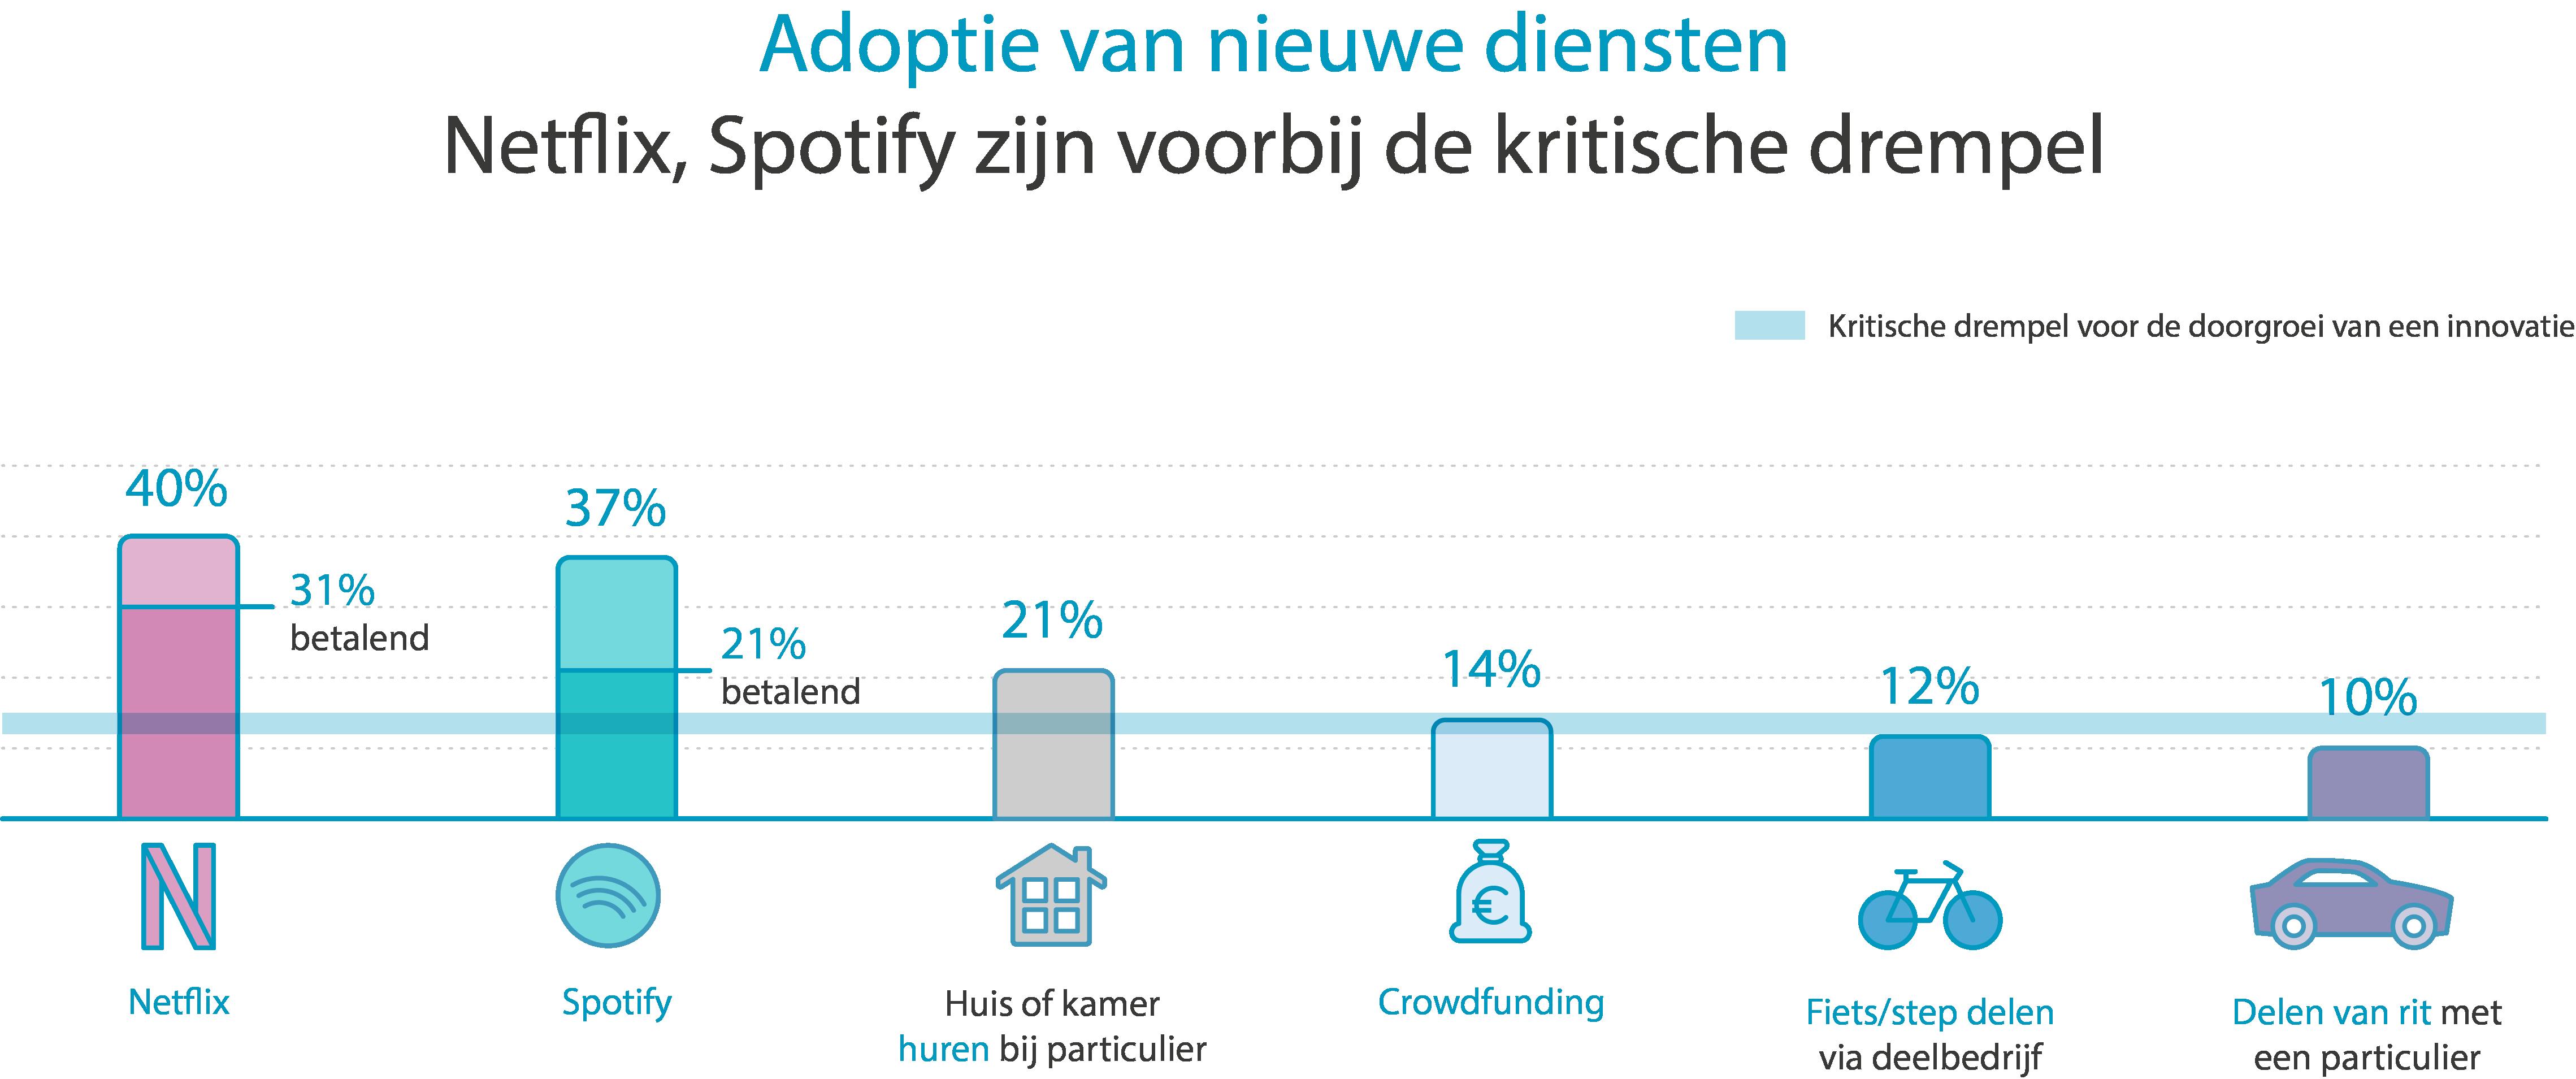 Adoptie van nieuwe diensten.jpg